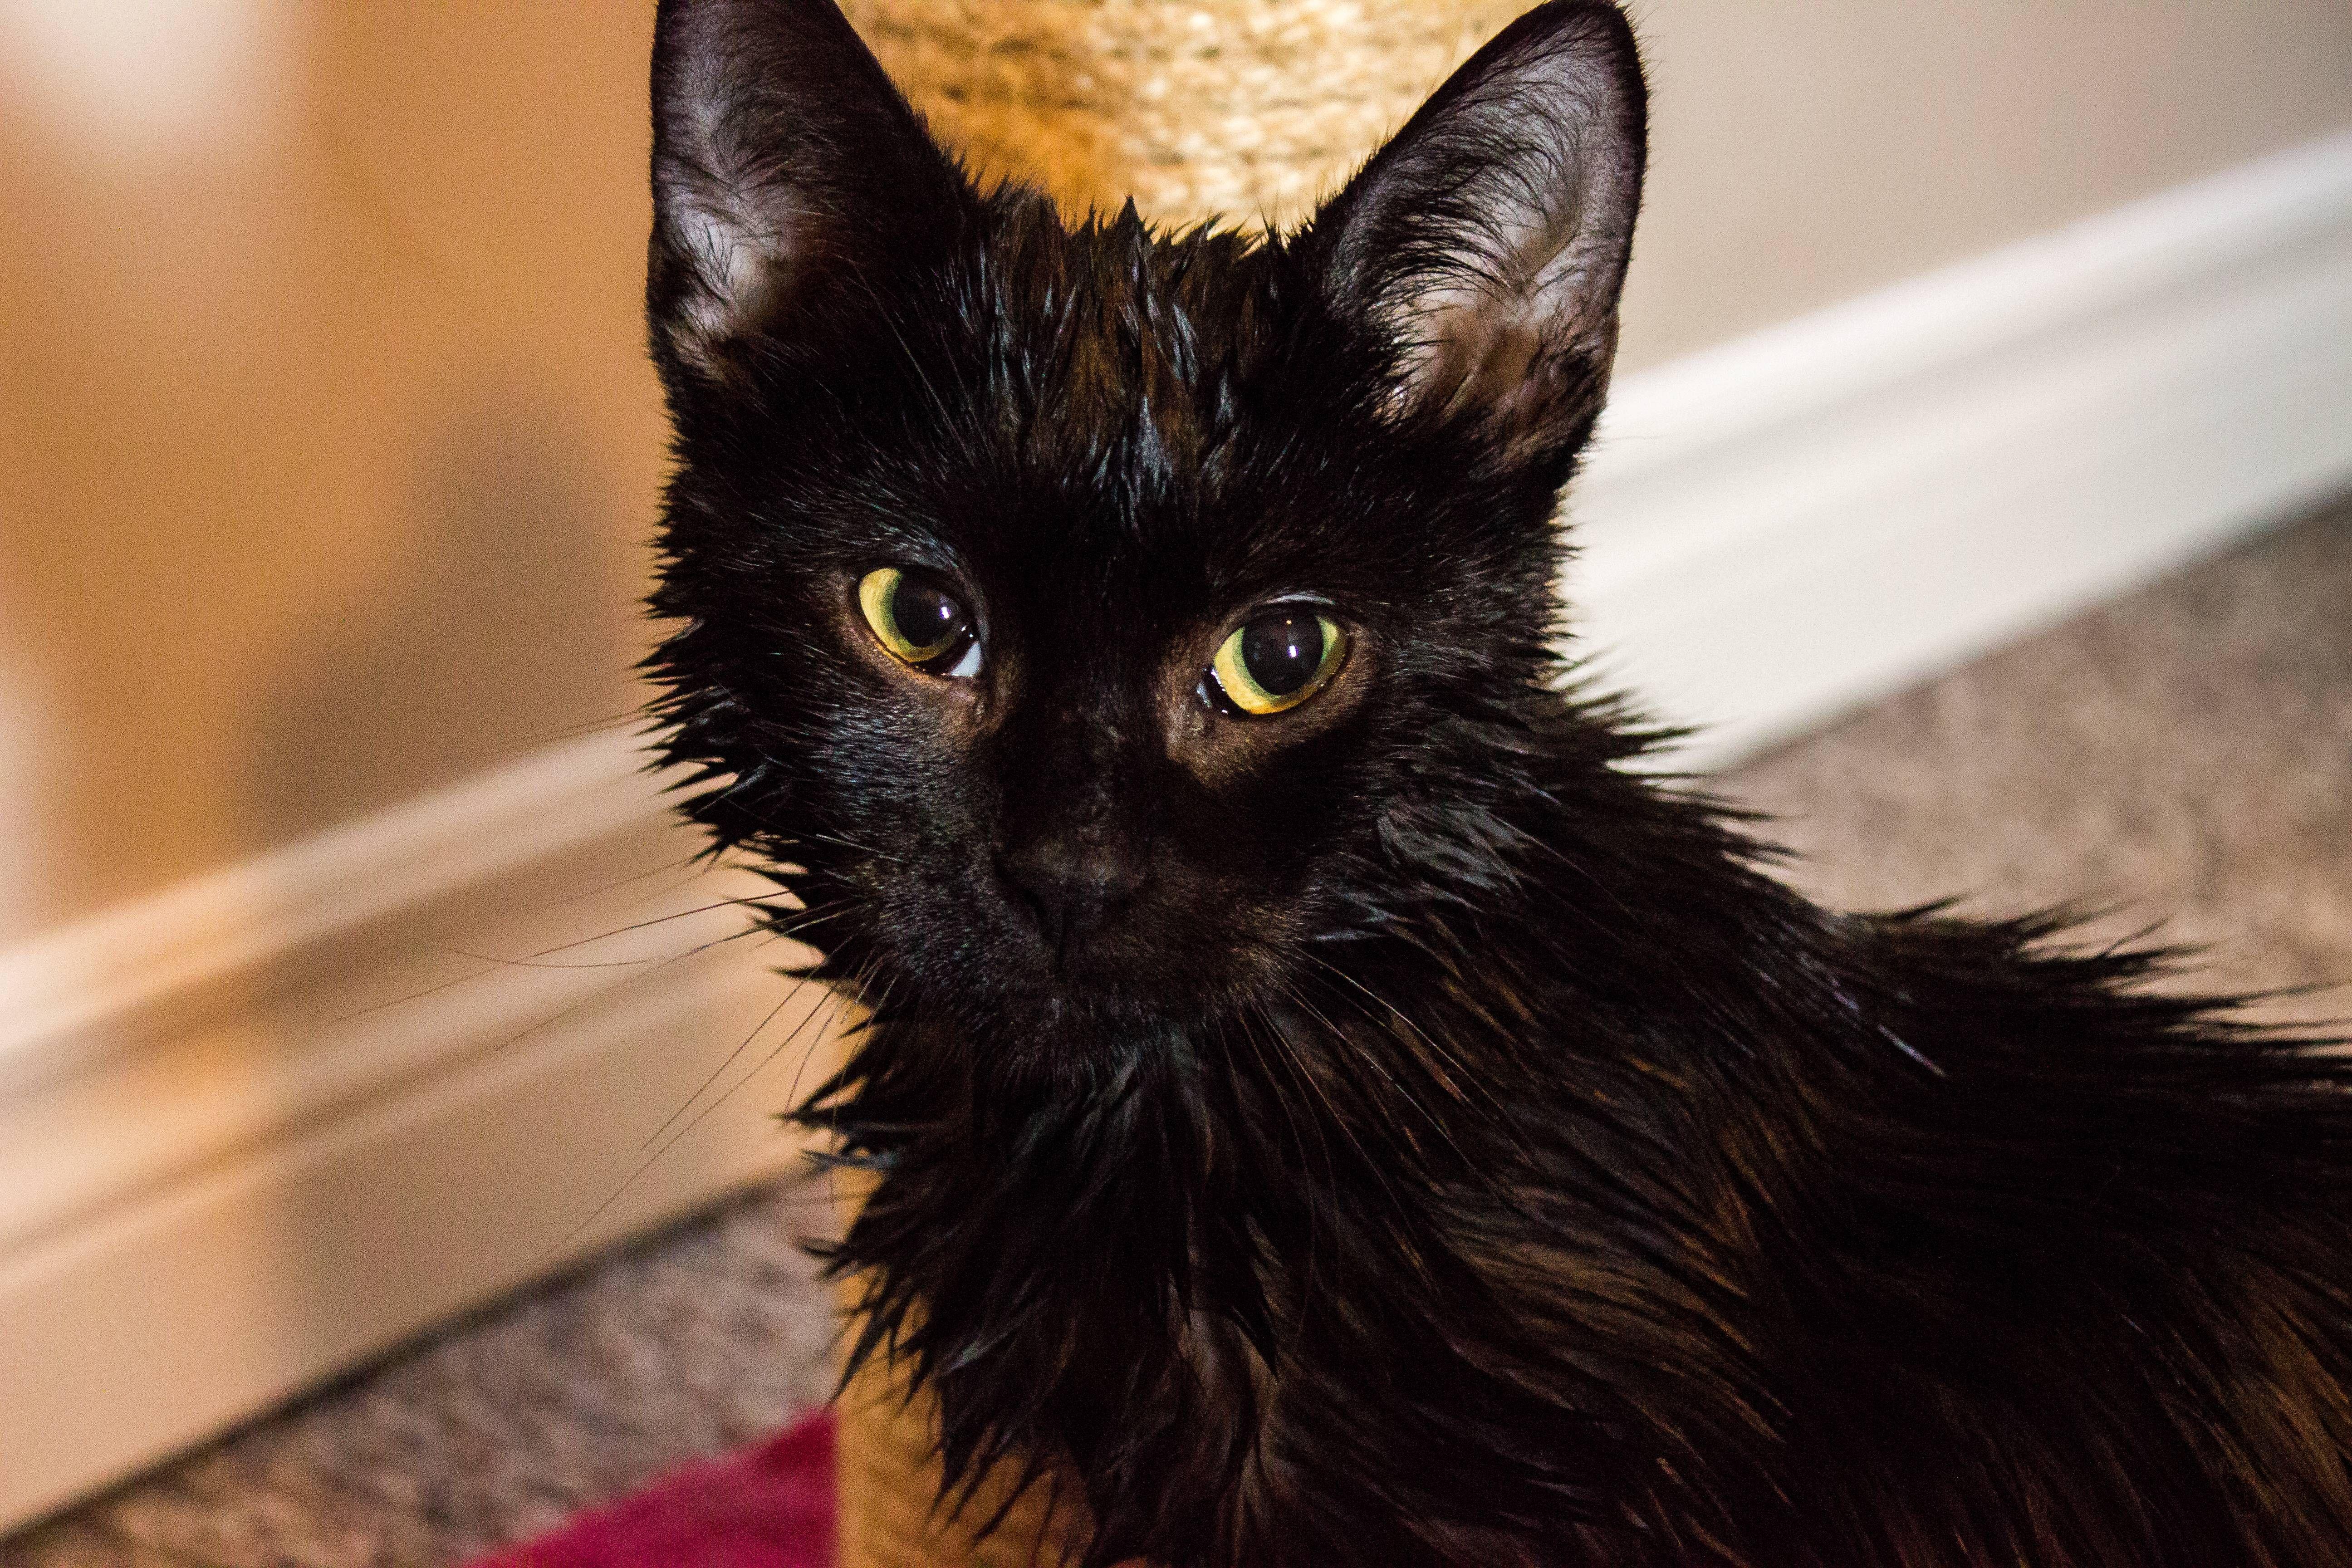 Stanky foster cat got a bath. Reddit meet Tony.